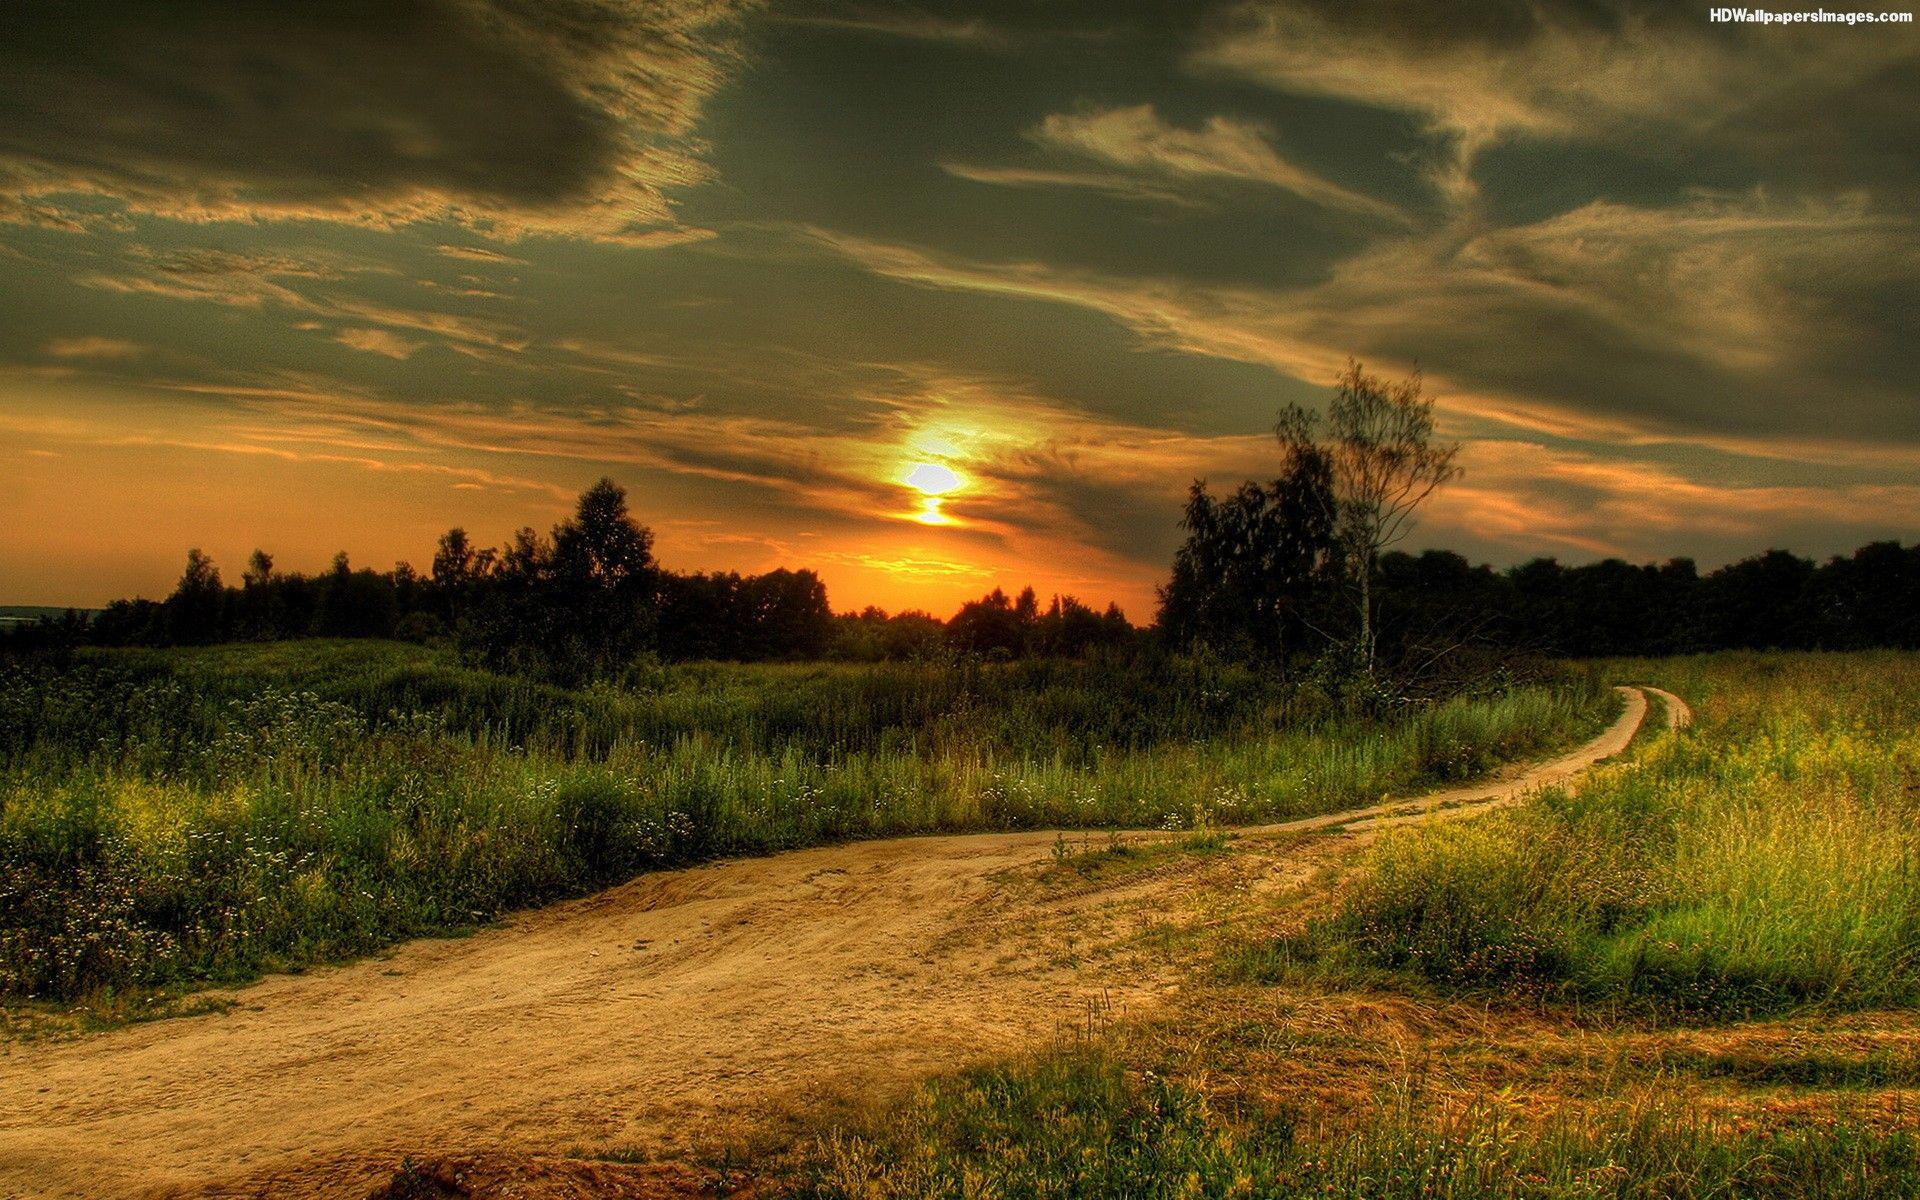 Sunsets Scenic Wallpaper Field Sunset Landscape Nature